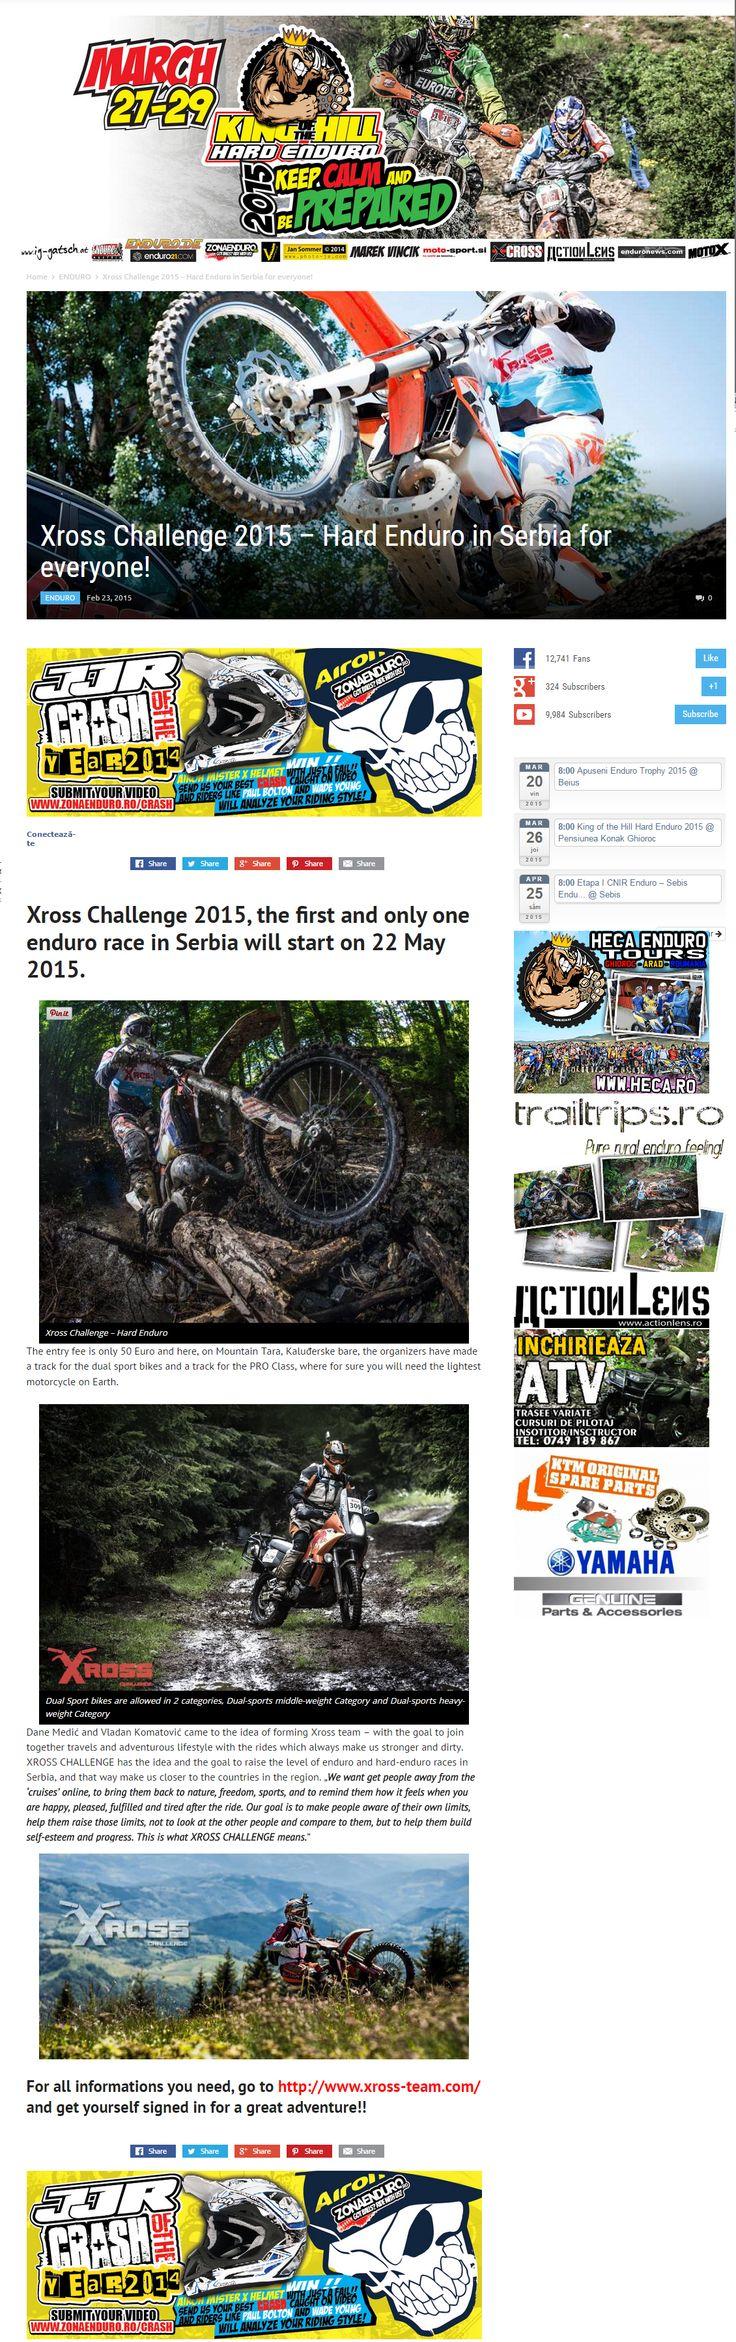 http://zonaenduro.ro/xross-challenge-2015-hard-enduro-in-serbia-for-everyone/ - #Romania #enduro #hardenduro #motocross #sport #adrenaline #race #Serbia